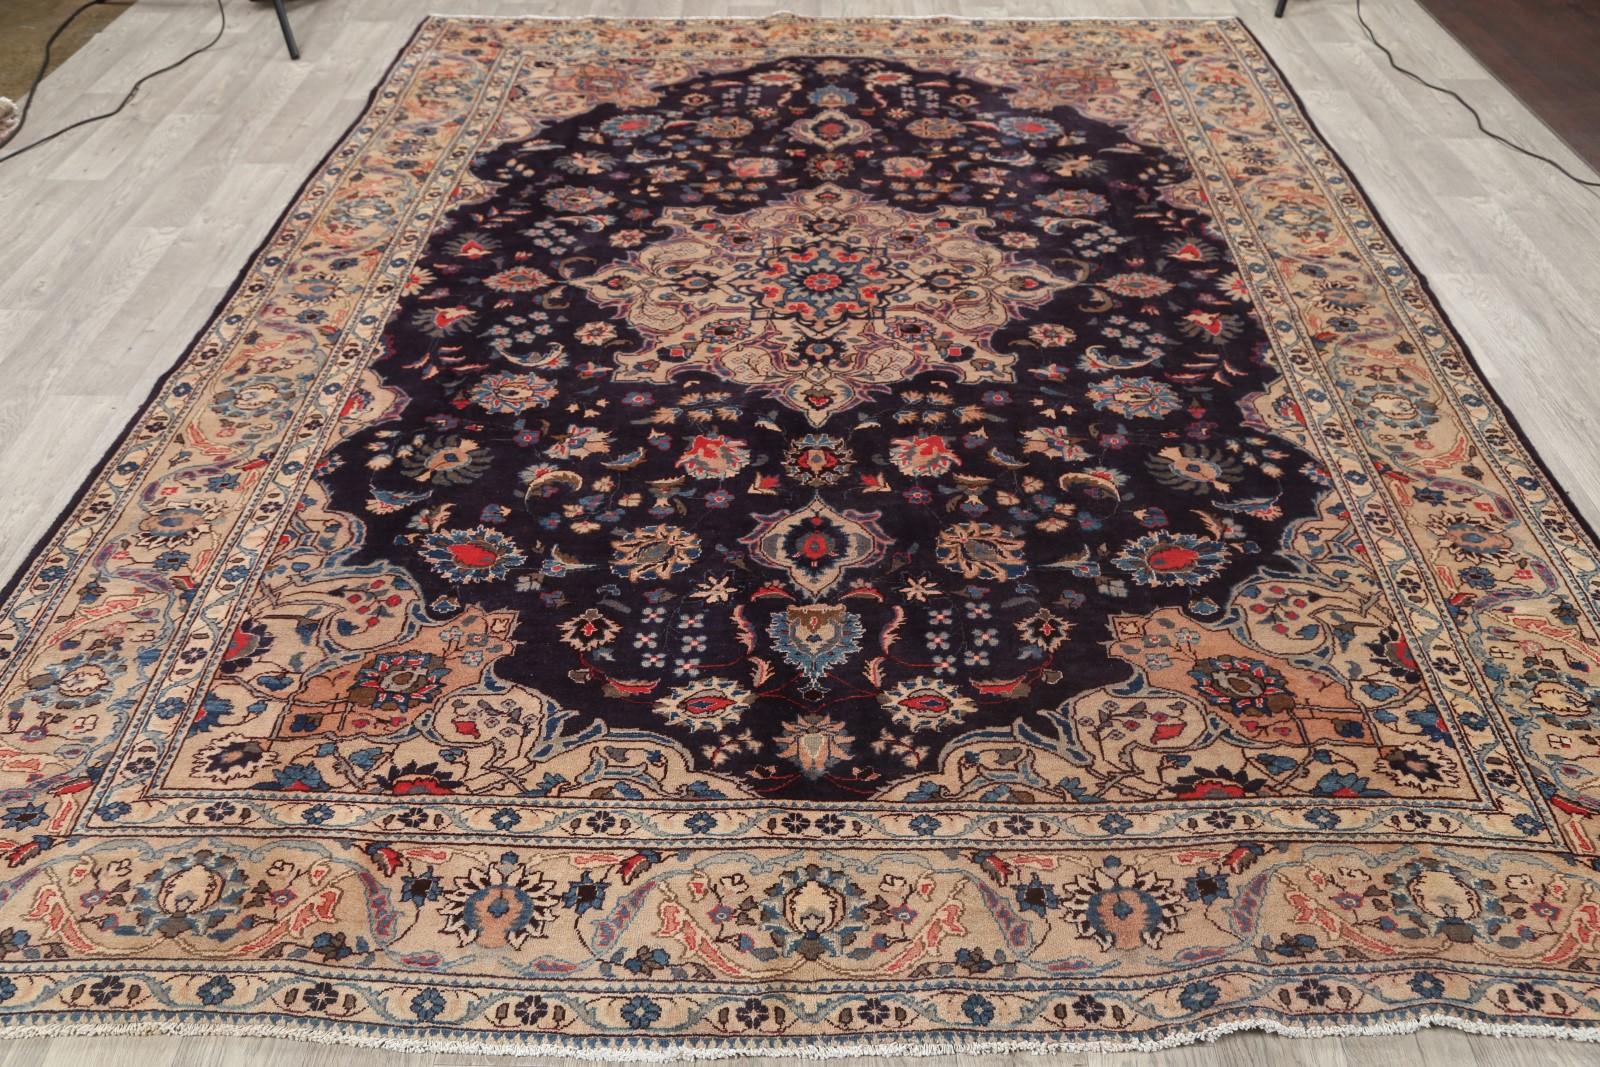 clearance floral 8x11 kashan persian area rug oriental carpet 10 39 7 x 8 39 2. Black Bedroom Furniture Sets. Home Design Ideas